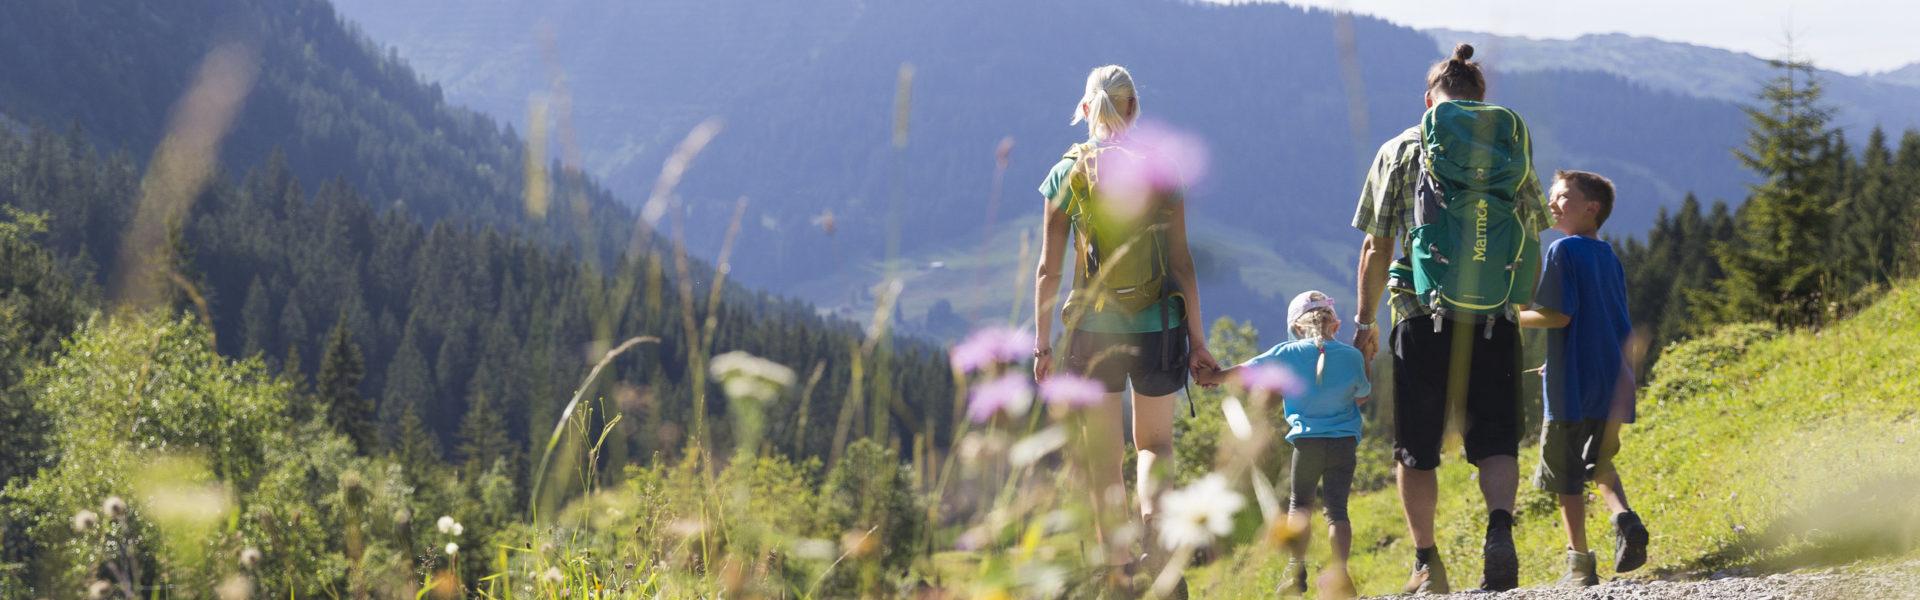 Wandern Familie Alpleben Fluchtalpe @Oliver Farys (50) © Oliver Farys / Kleinwalsertal Tourismus eGen | Fotograf: Oliver Farys